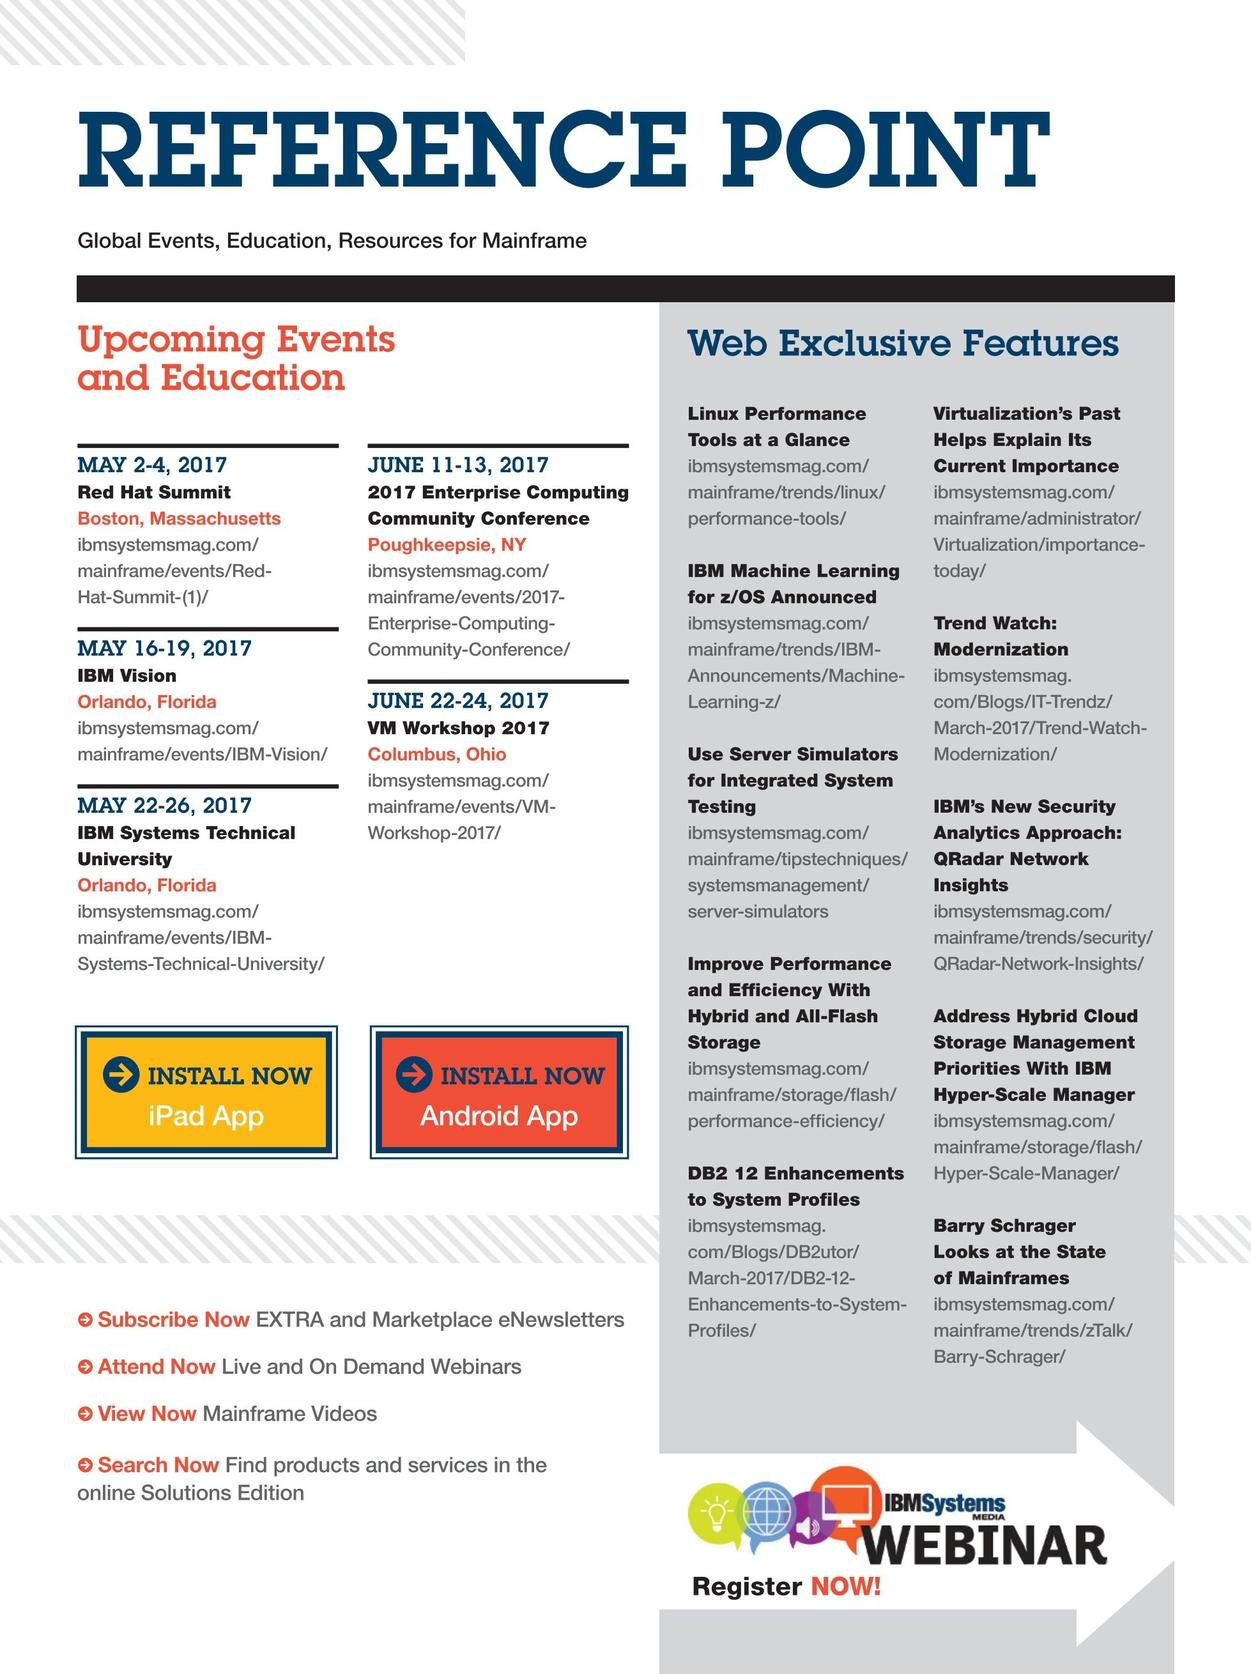 IBM Systems Magazine, Mainframe - May/June 2017